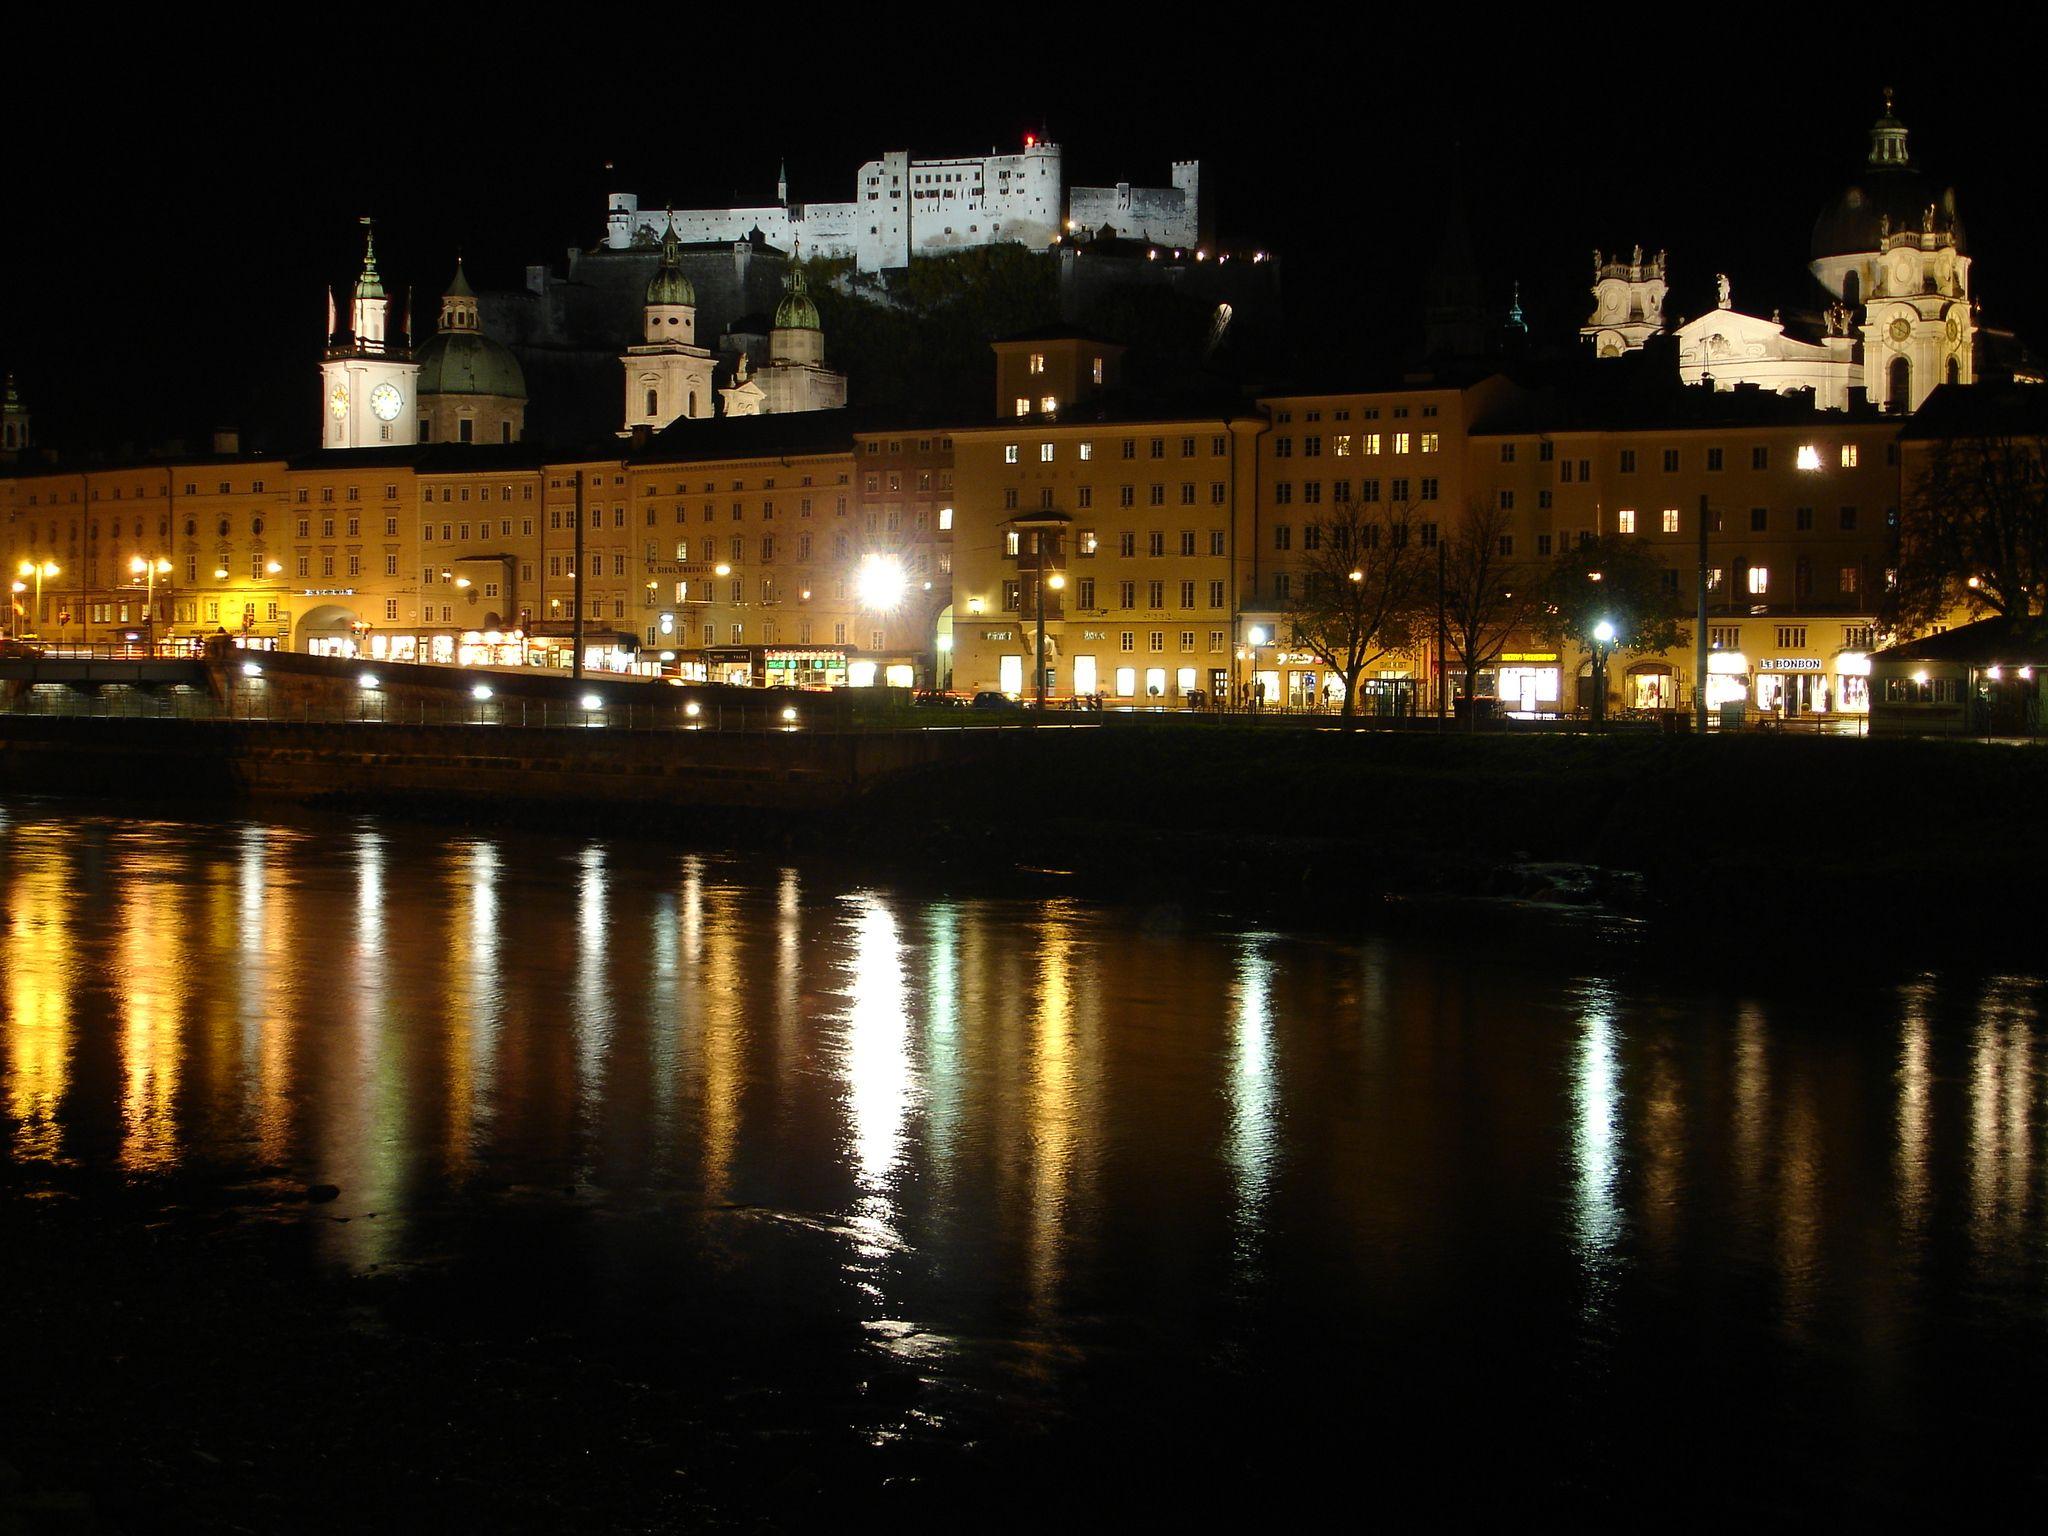 The fortress (background), Salzburg Cathedral (middle), River Salzach (foreground), Salzburg, Austria